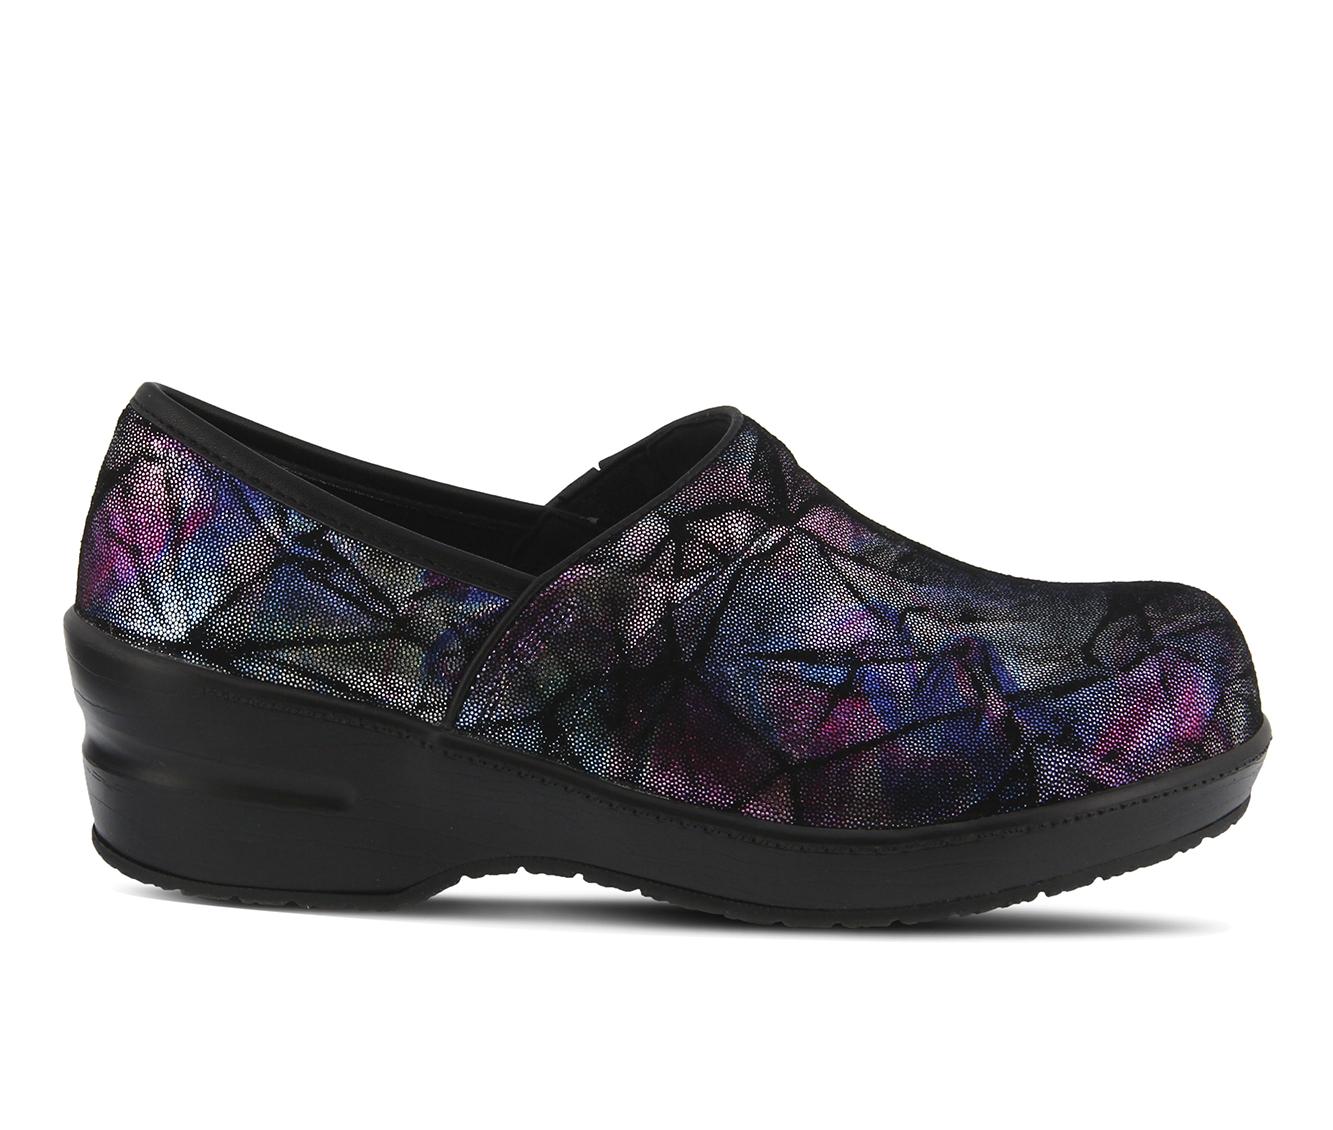 SPRING STEP Selle Foil Men's Boots (Purple - Leather)